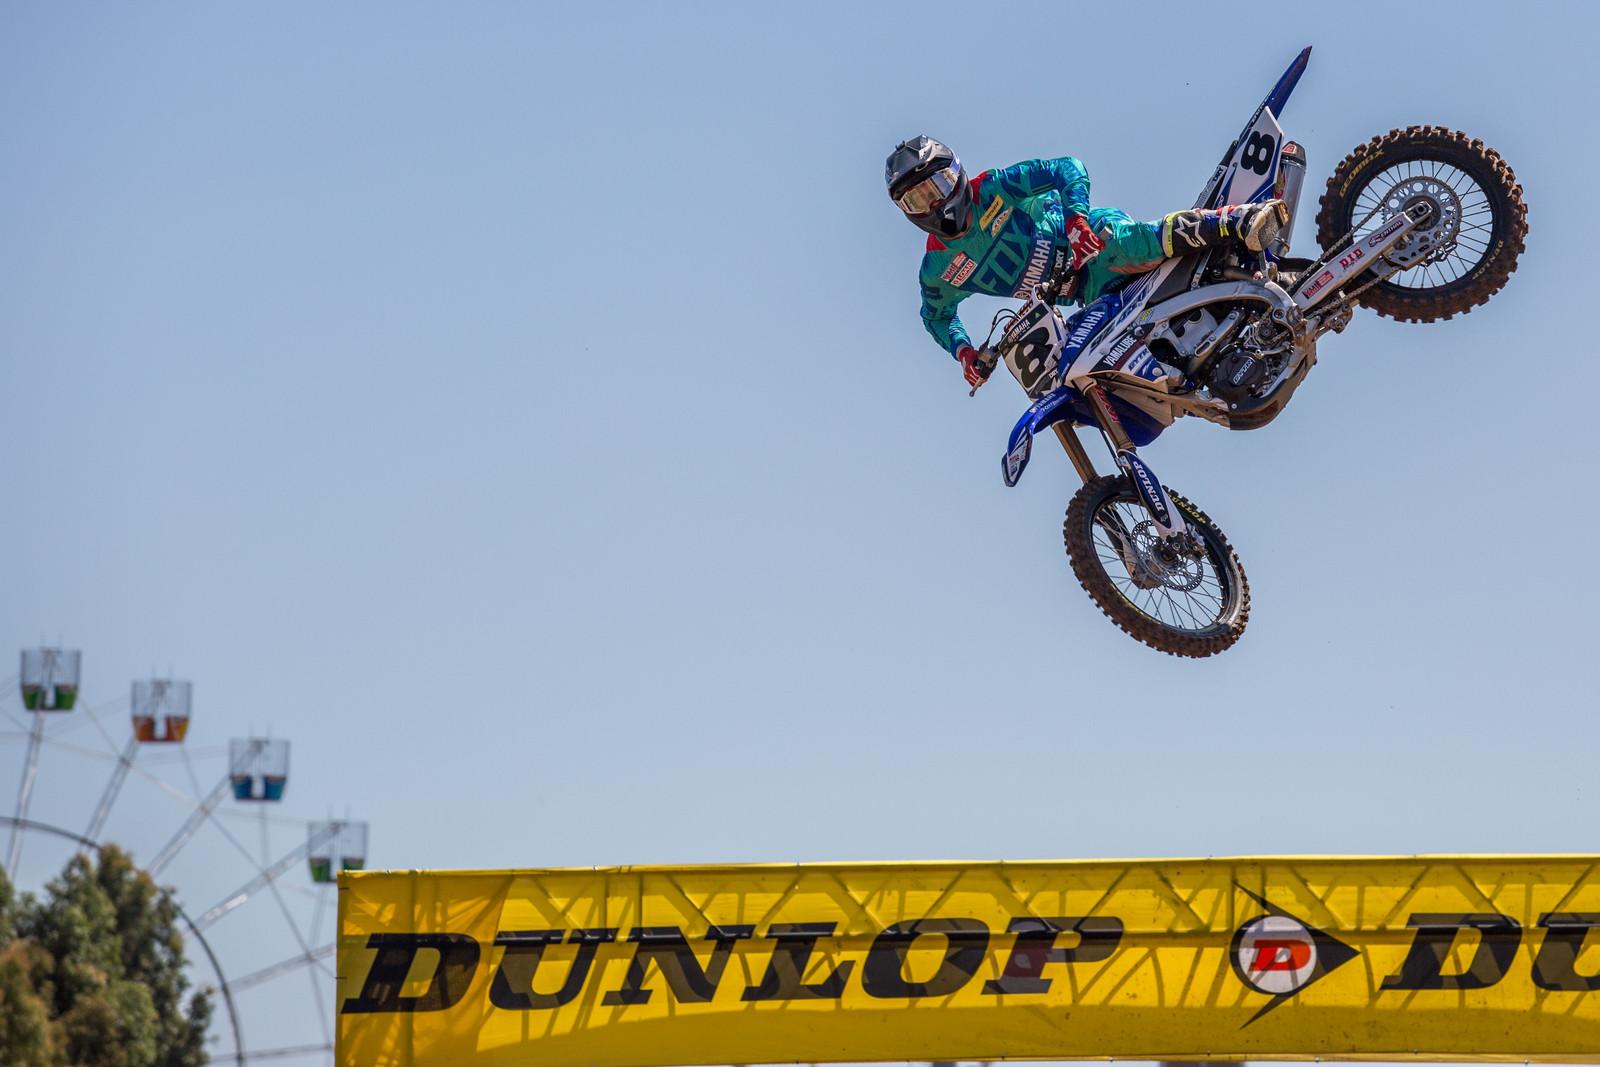 Kade Mosig - Photo Blast: Australian Supercross Championship from Adelaide - Motocross Pictures - Vital MX